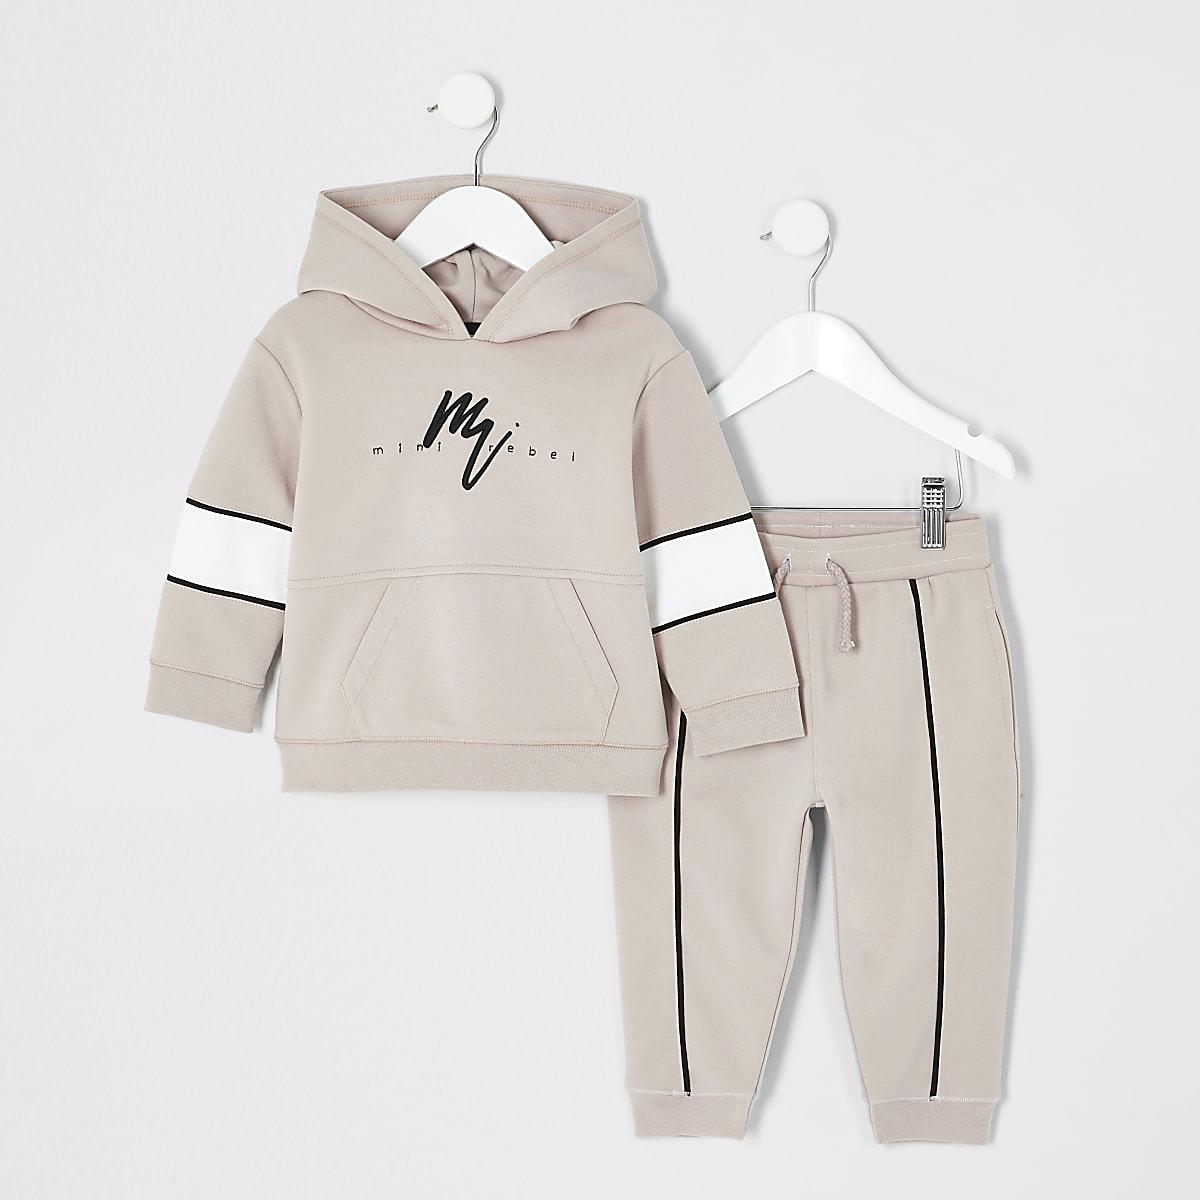 Mini boys stone 'rebel' hoodie outfit